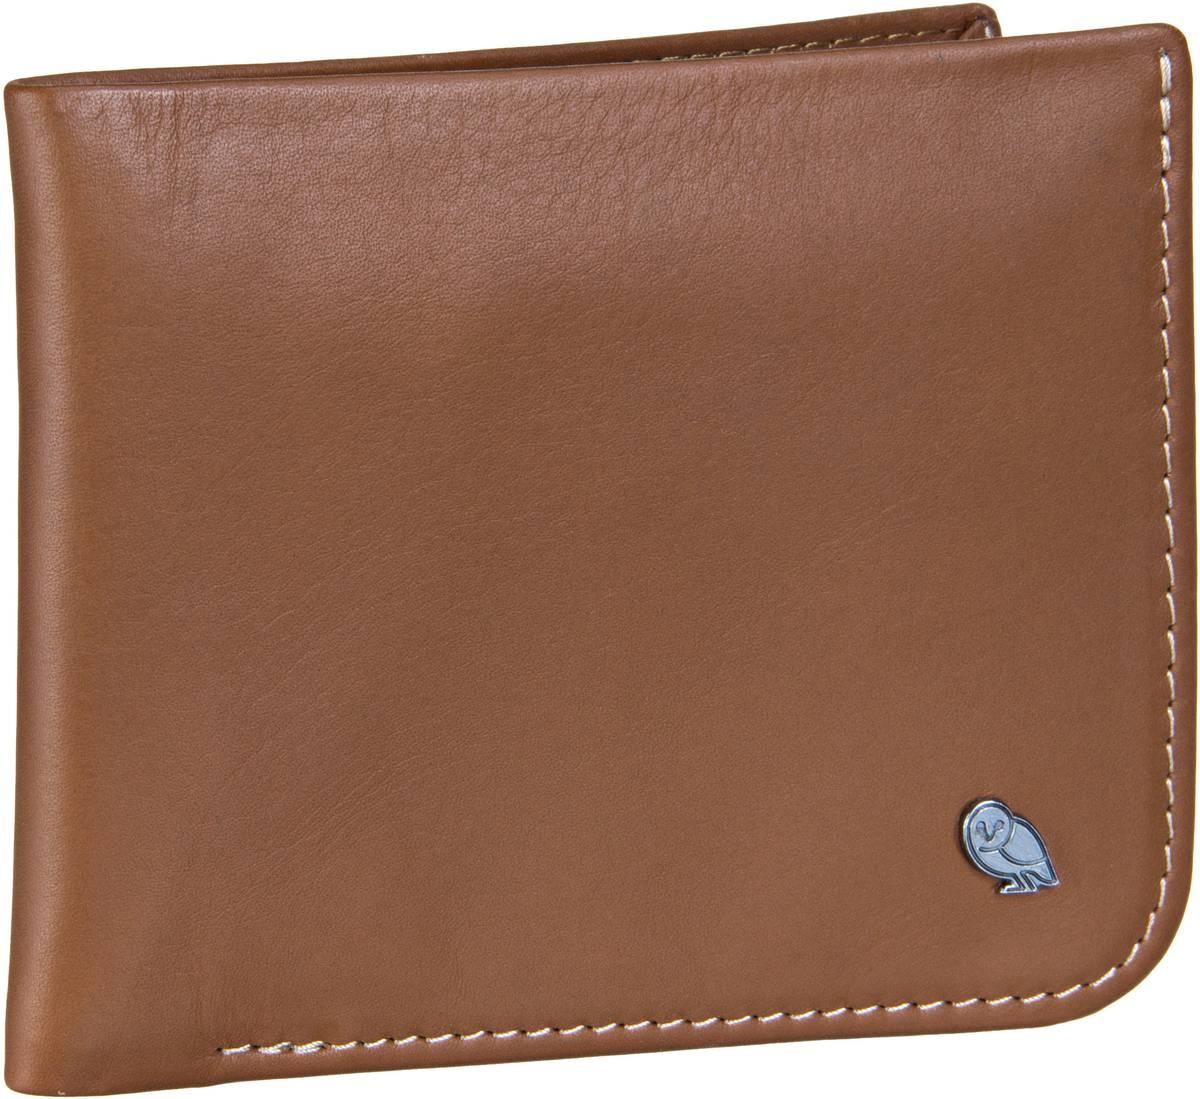 Bellroy Hide & Seek RFID Caramel-RFID - Geldbörse - broschei